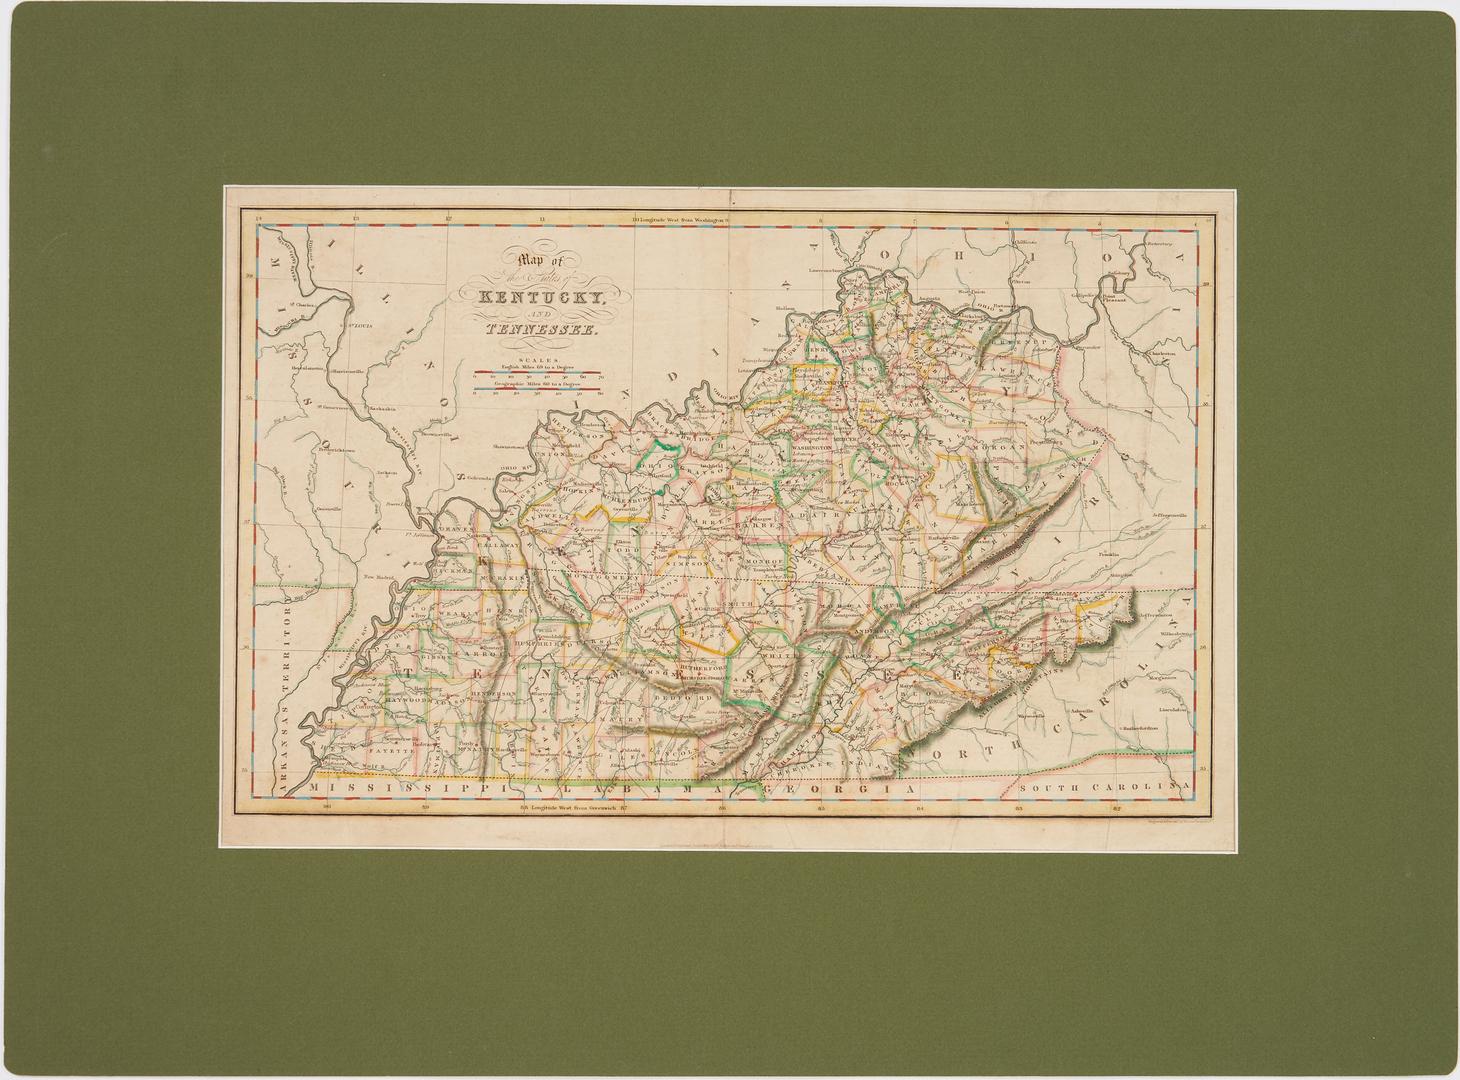 Lot 711: 4 KY and TN Maps plus KY Civil War Print, 5 items